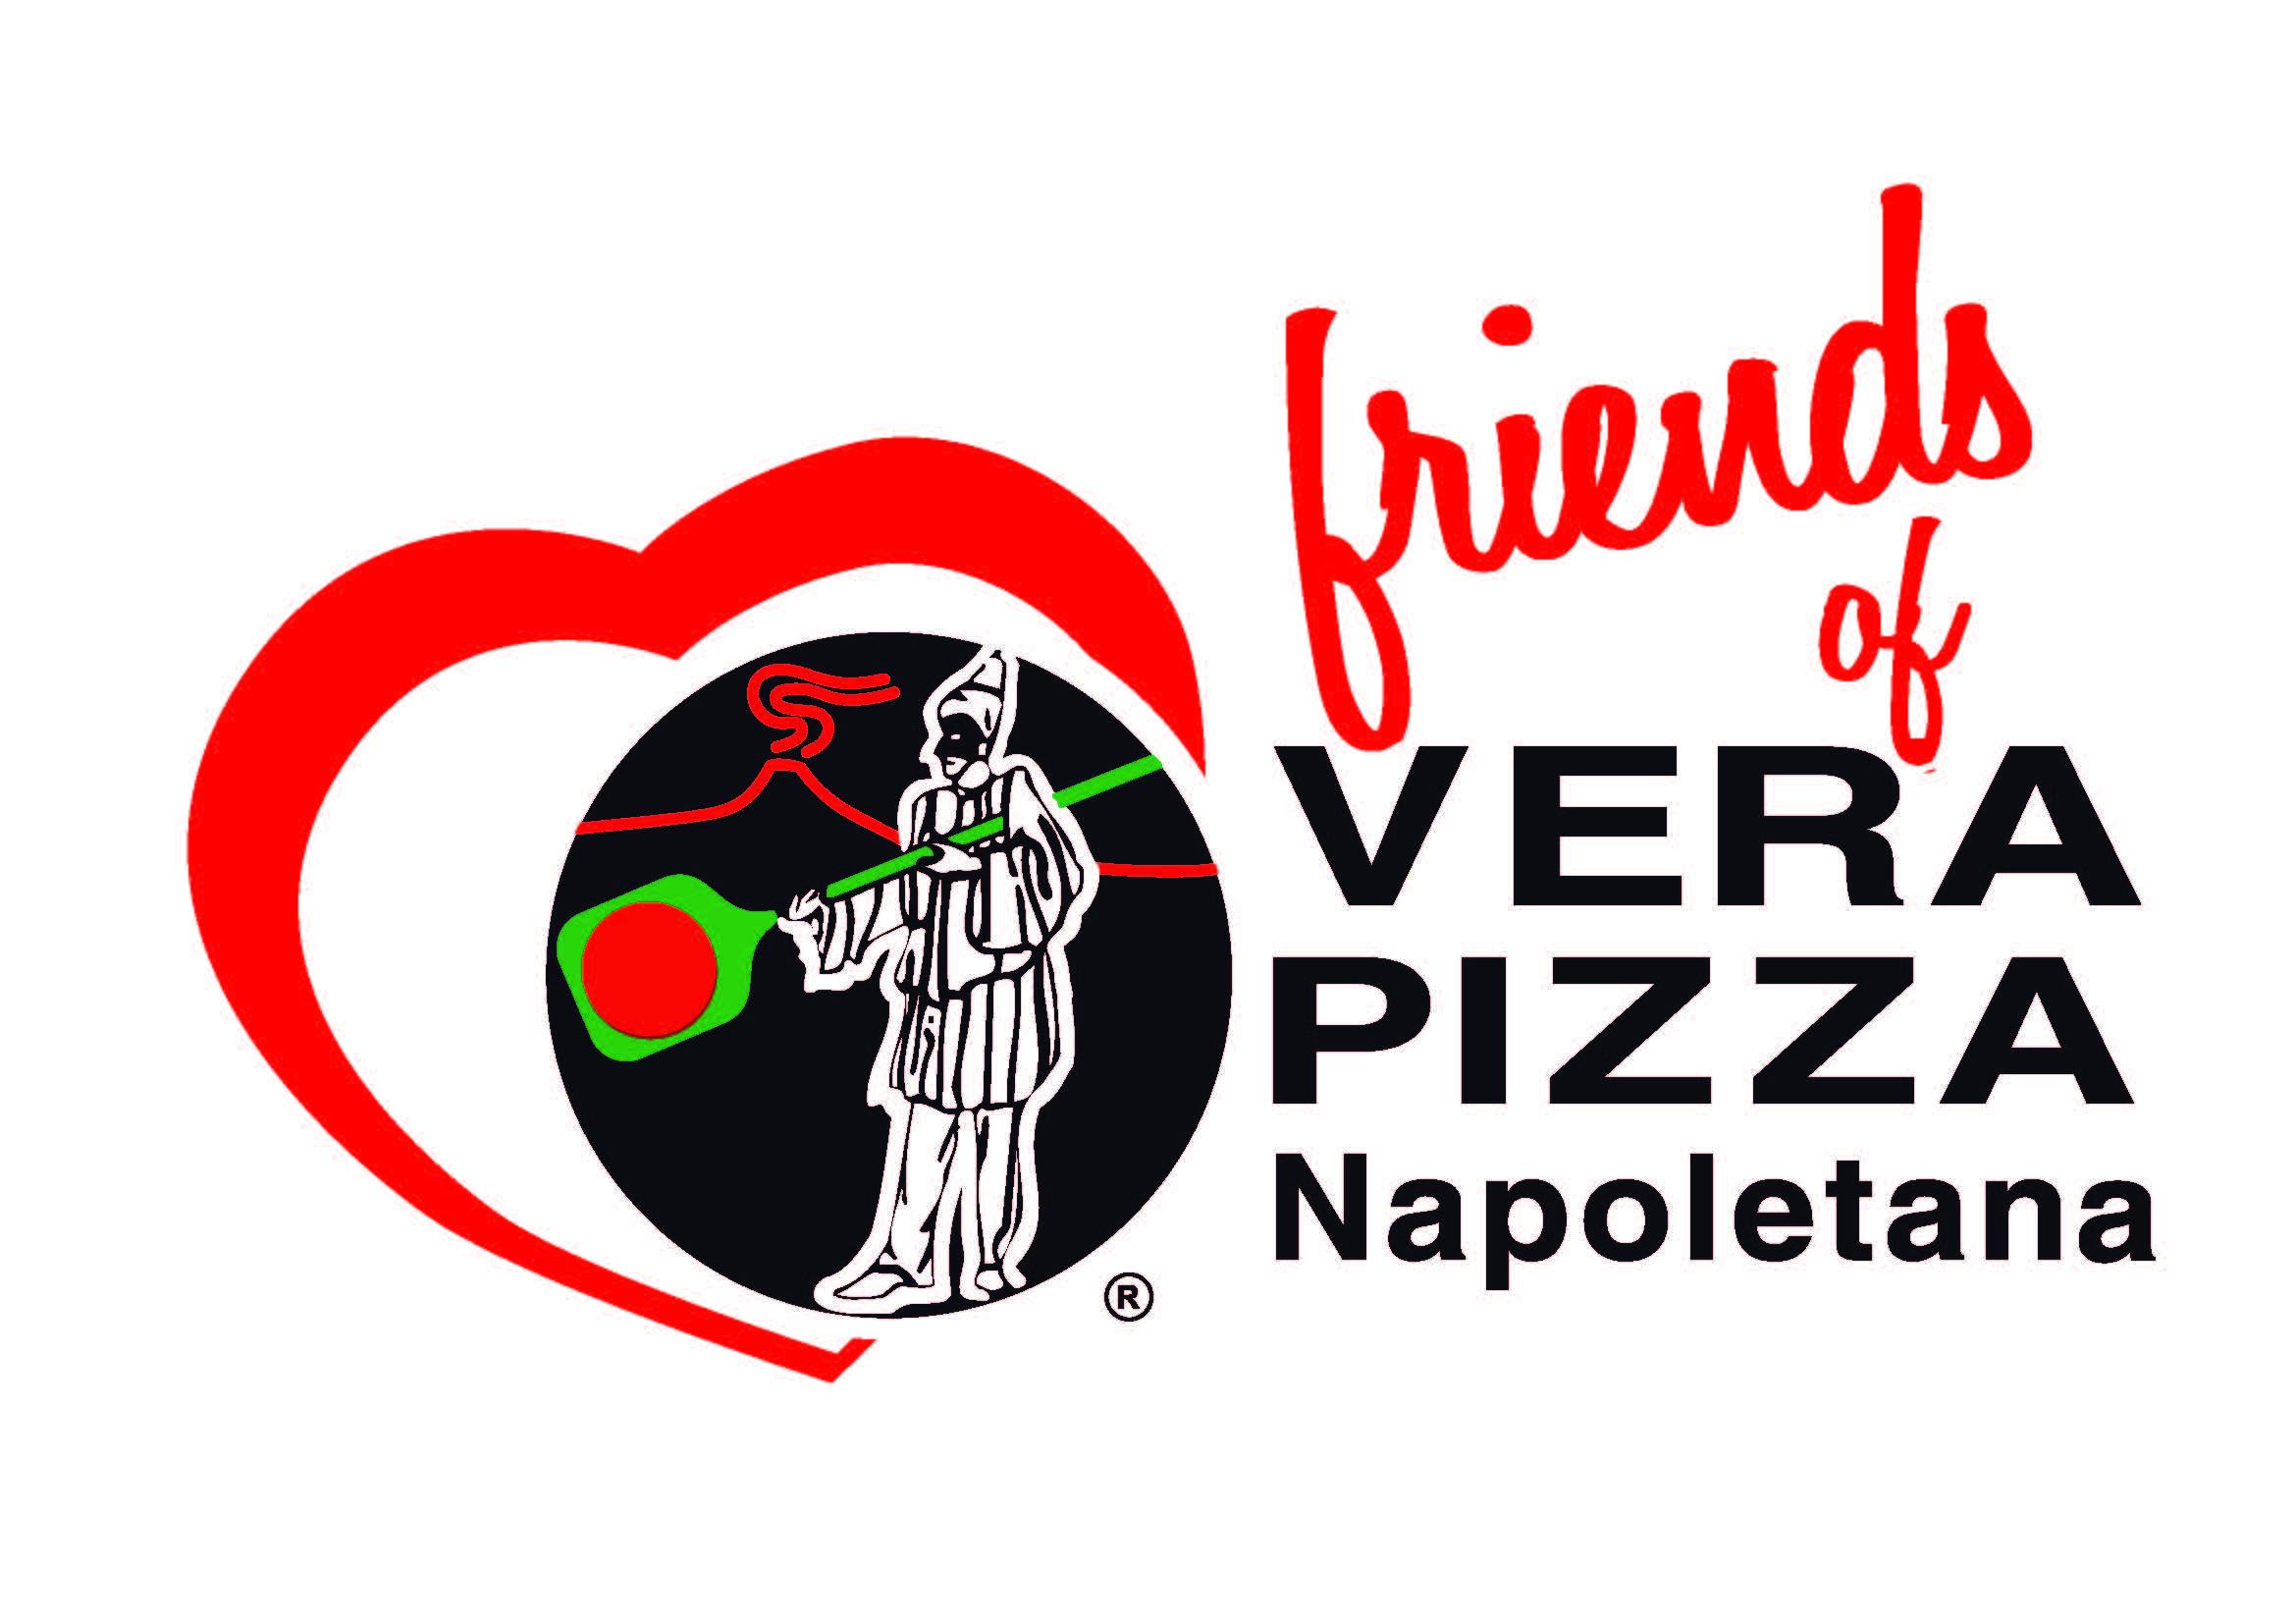 Club-Logo-vera-pizza-napoletana